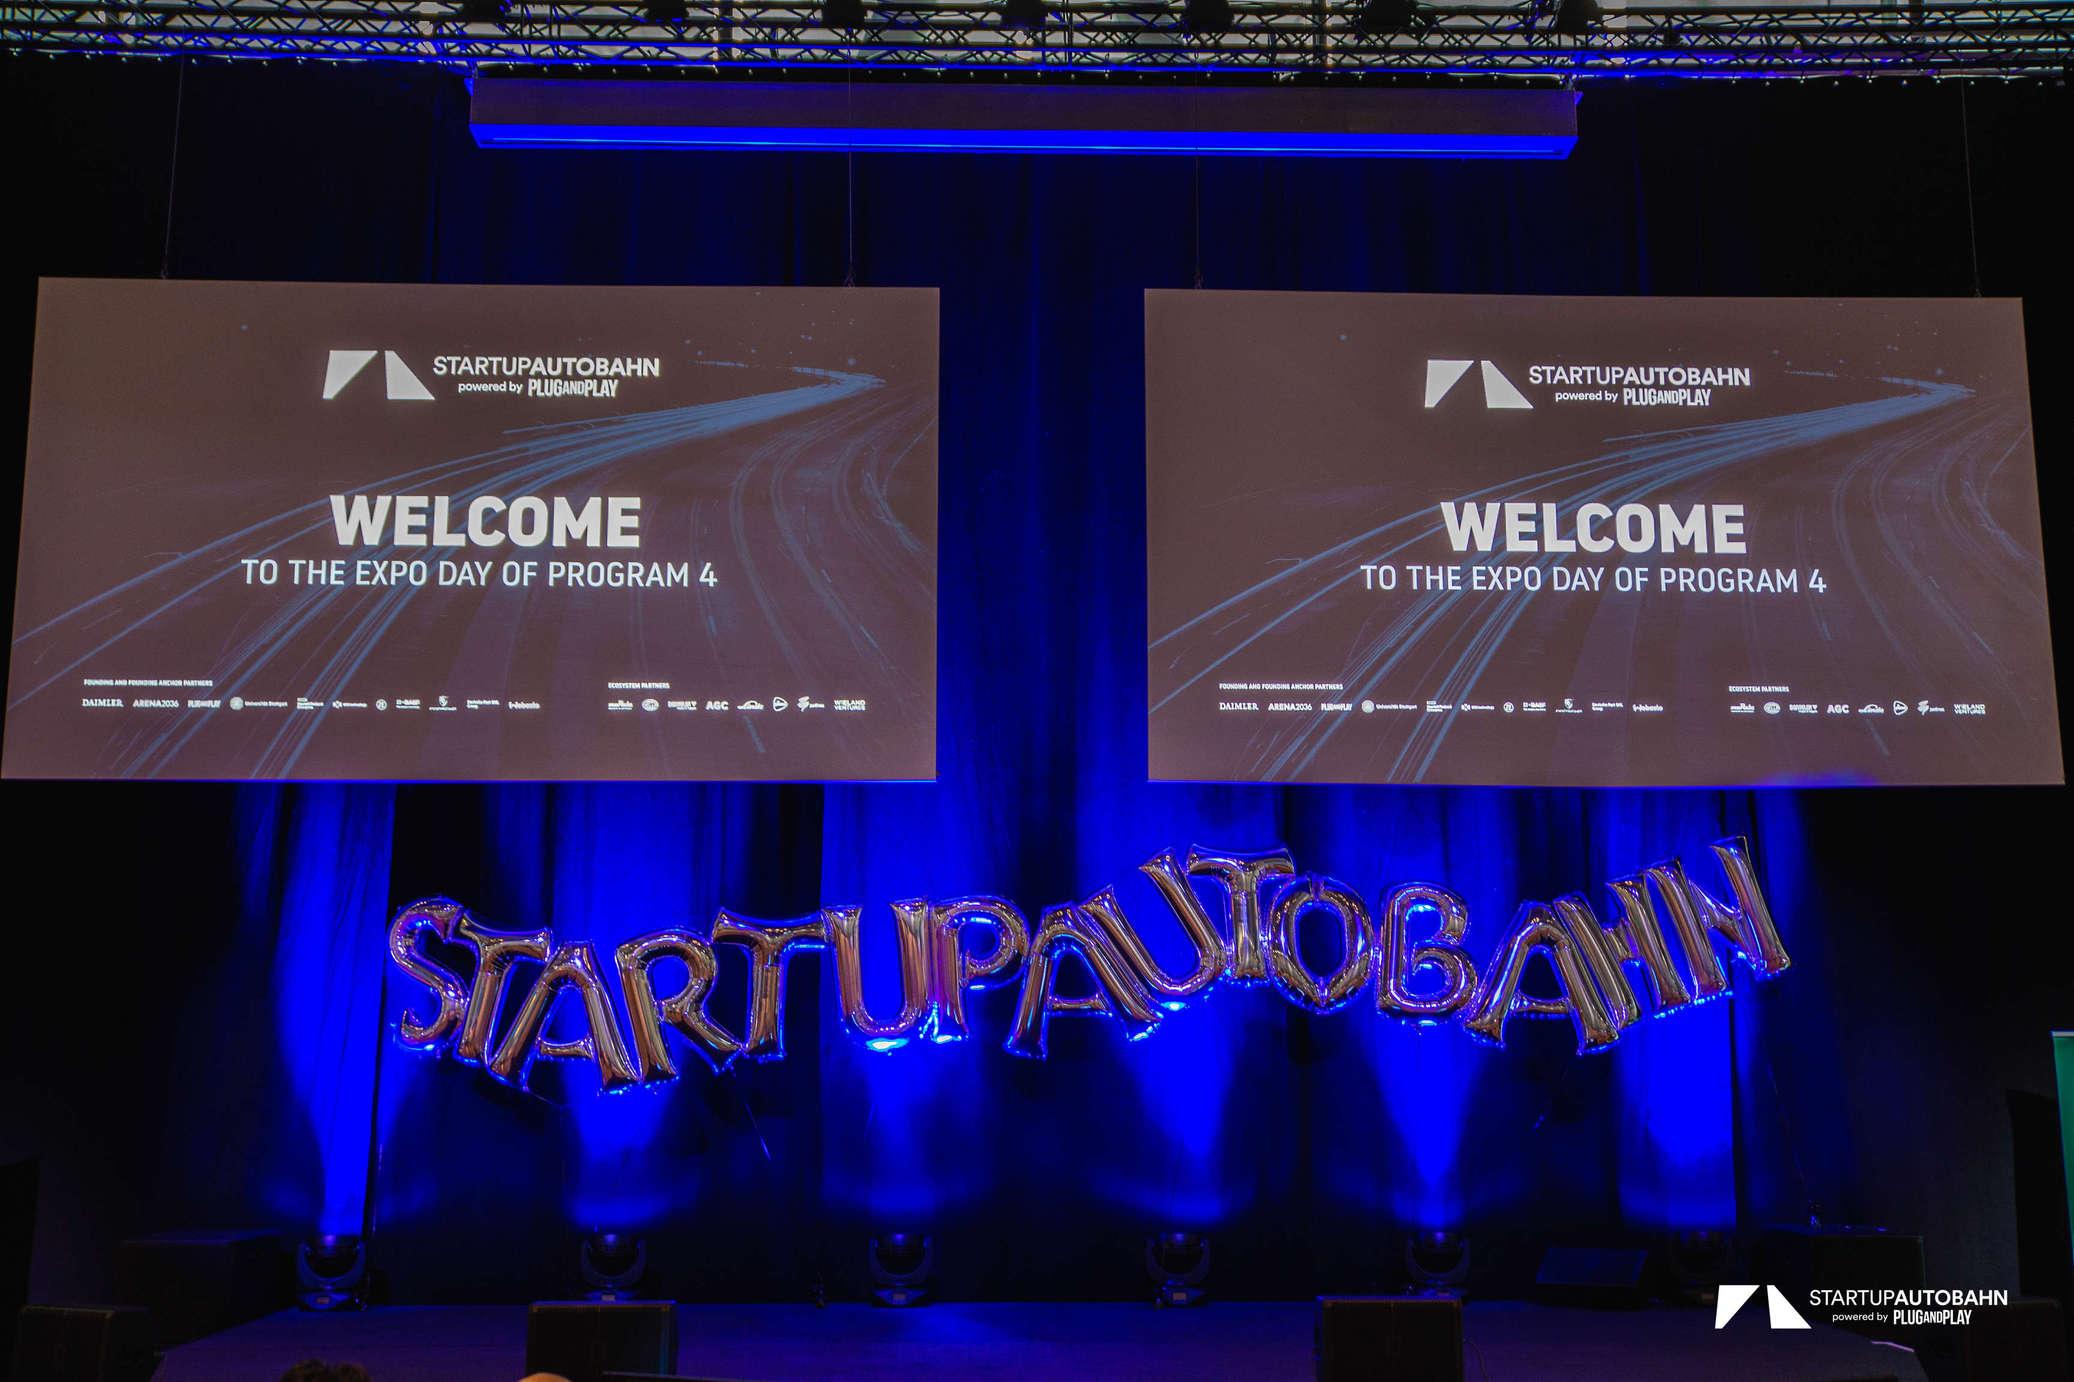 EXPO Day 5 | STARTUP AUTOBAHN